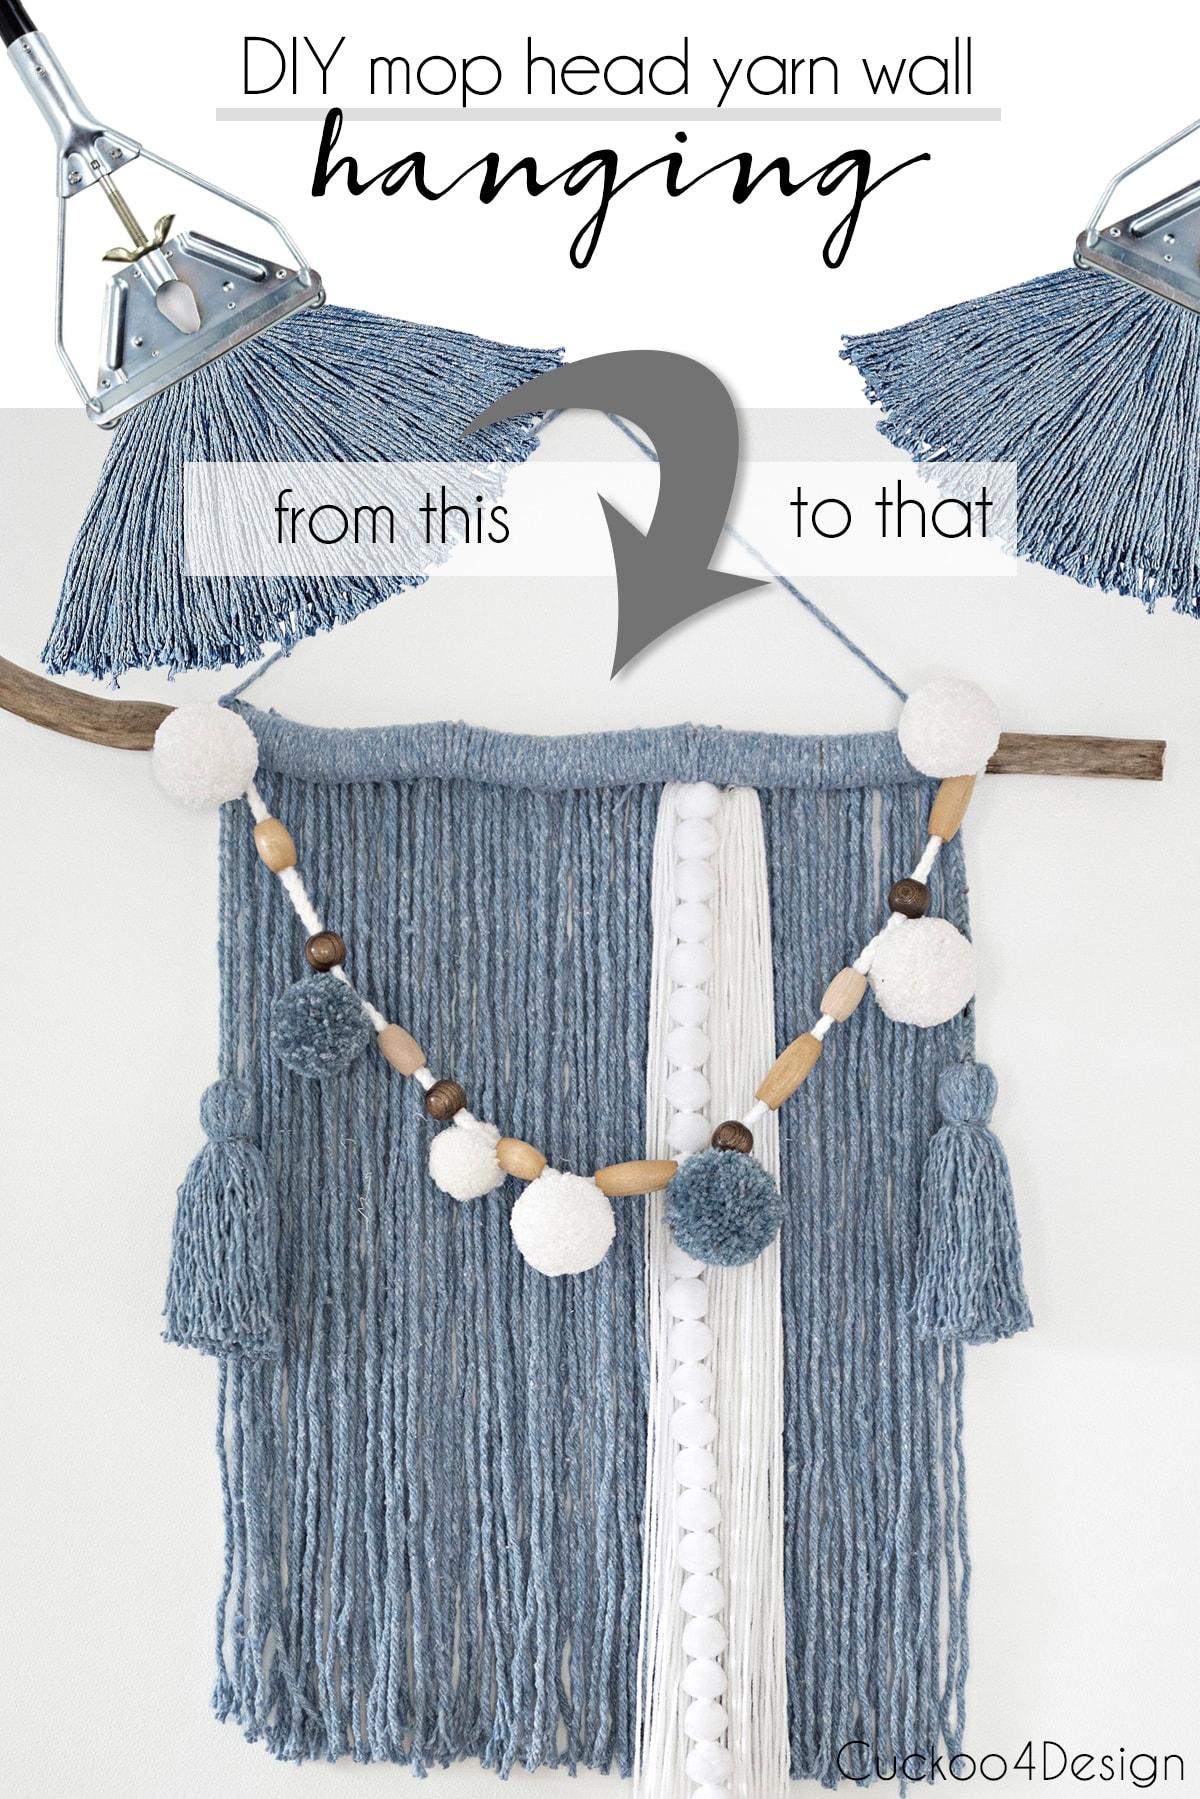 DIY blue mop head yarn wall hanging